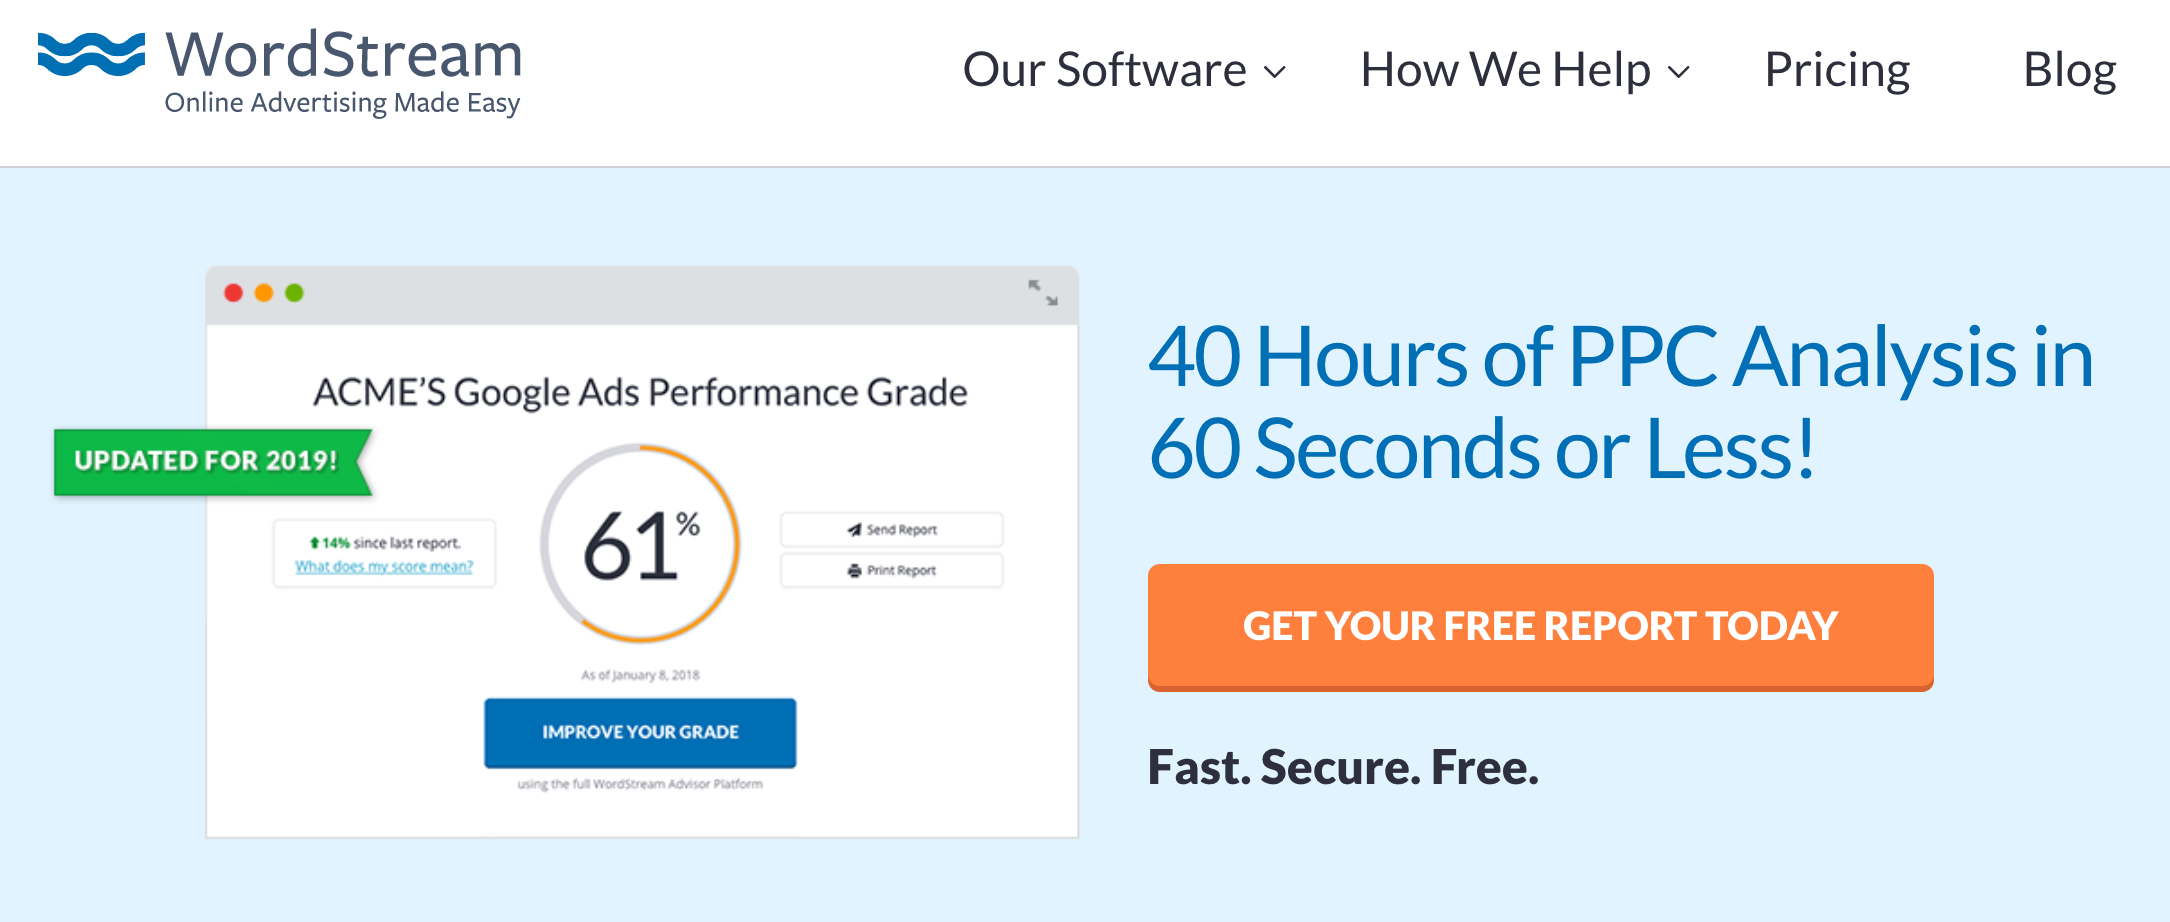 WordStream Google Ads Performance Grade